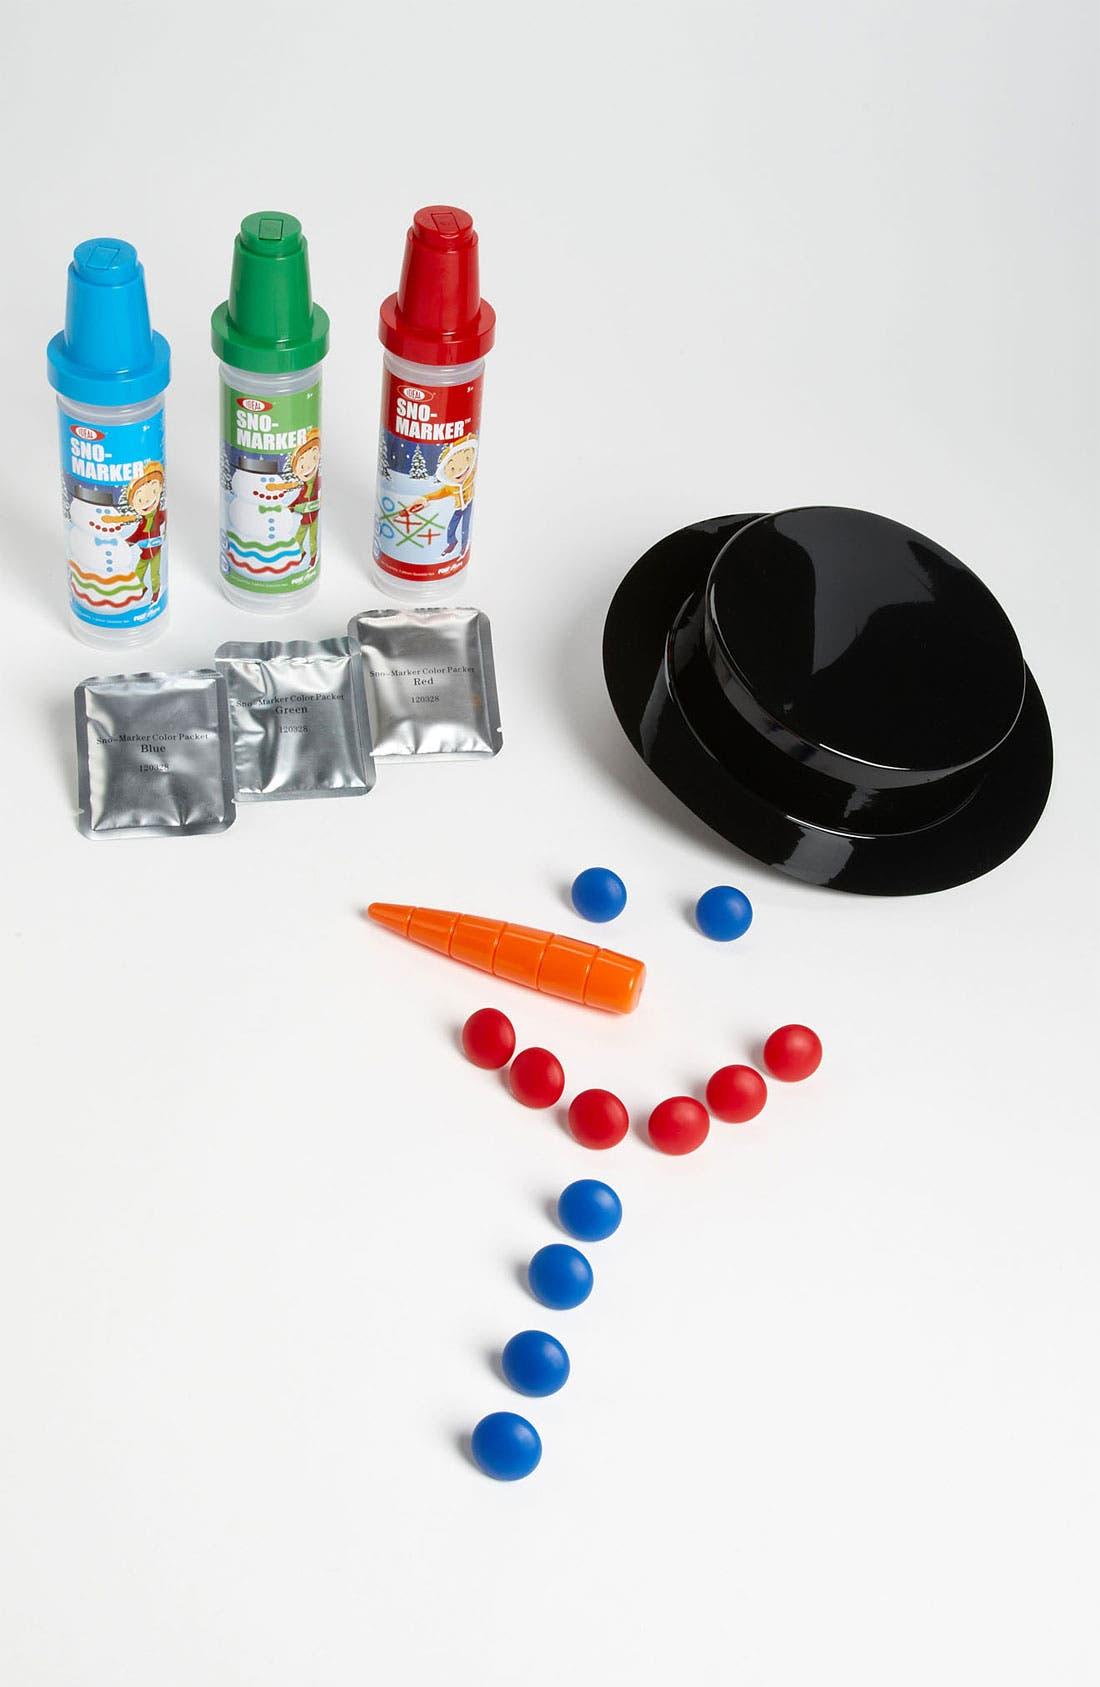 Alternate Image 1 Selected - Poof-Slinky Snowman Paint Kit